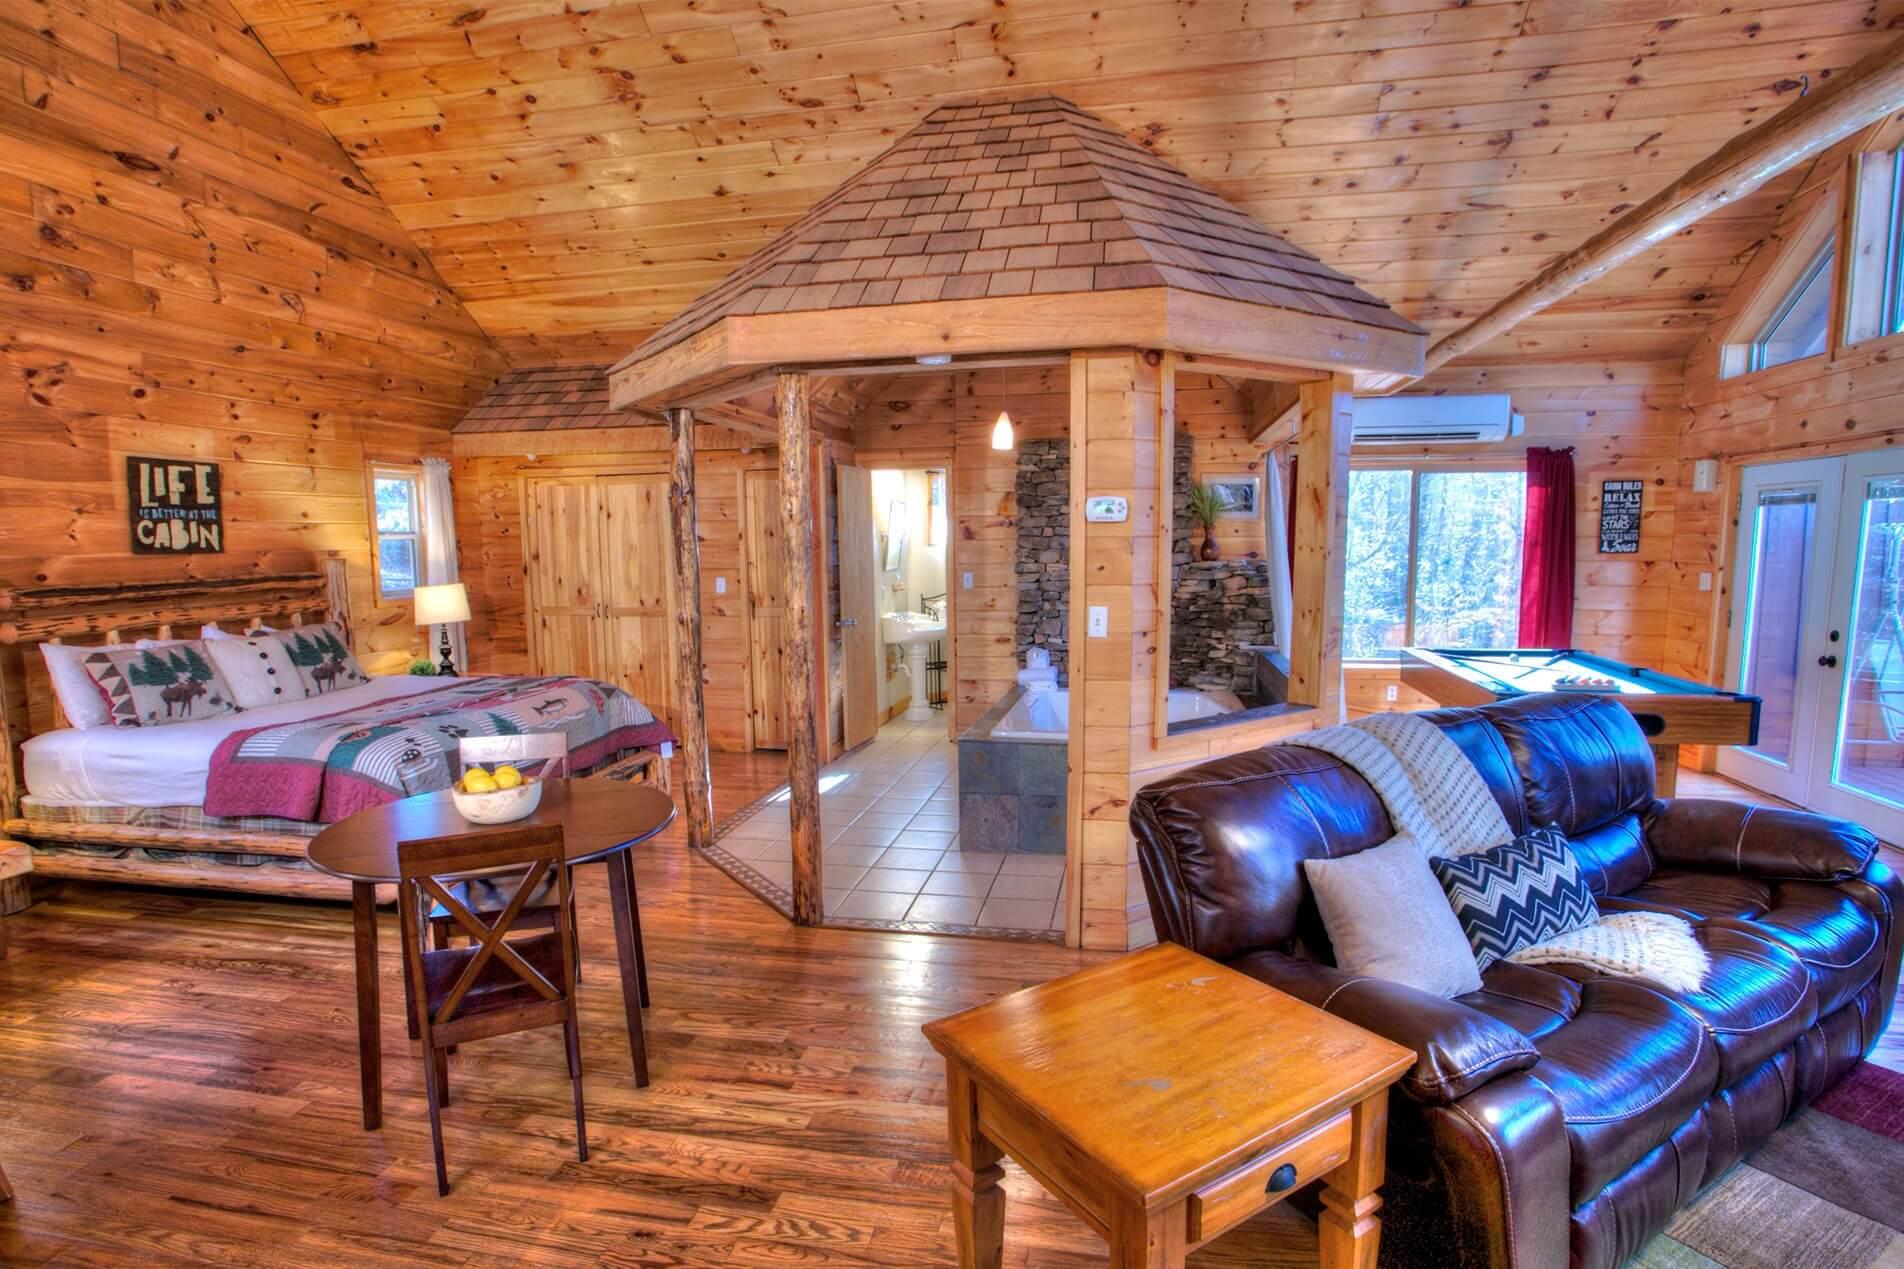 Enchantment-Cedar-Creek-Cabin-Rentals-Helen-Georgia-top-banner-tiny